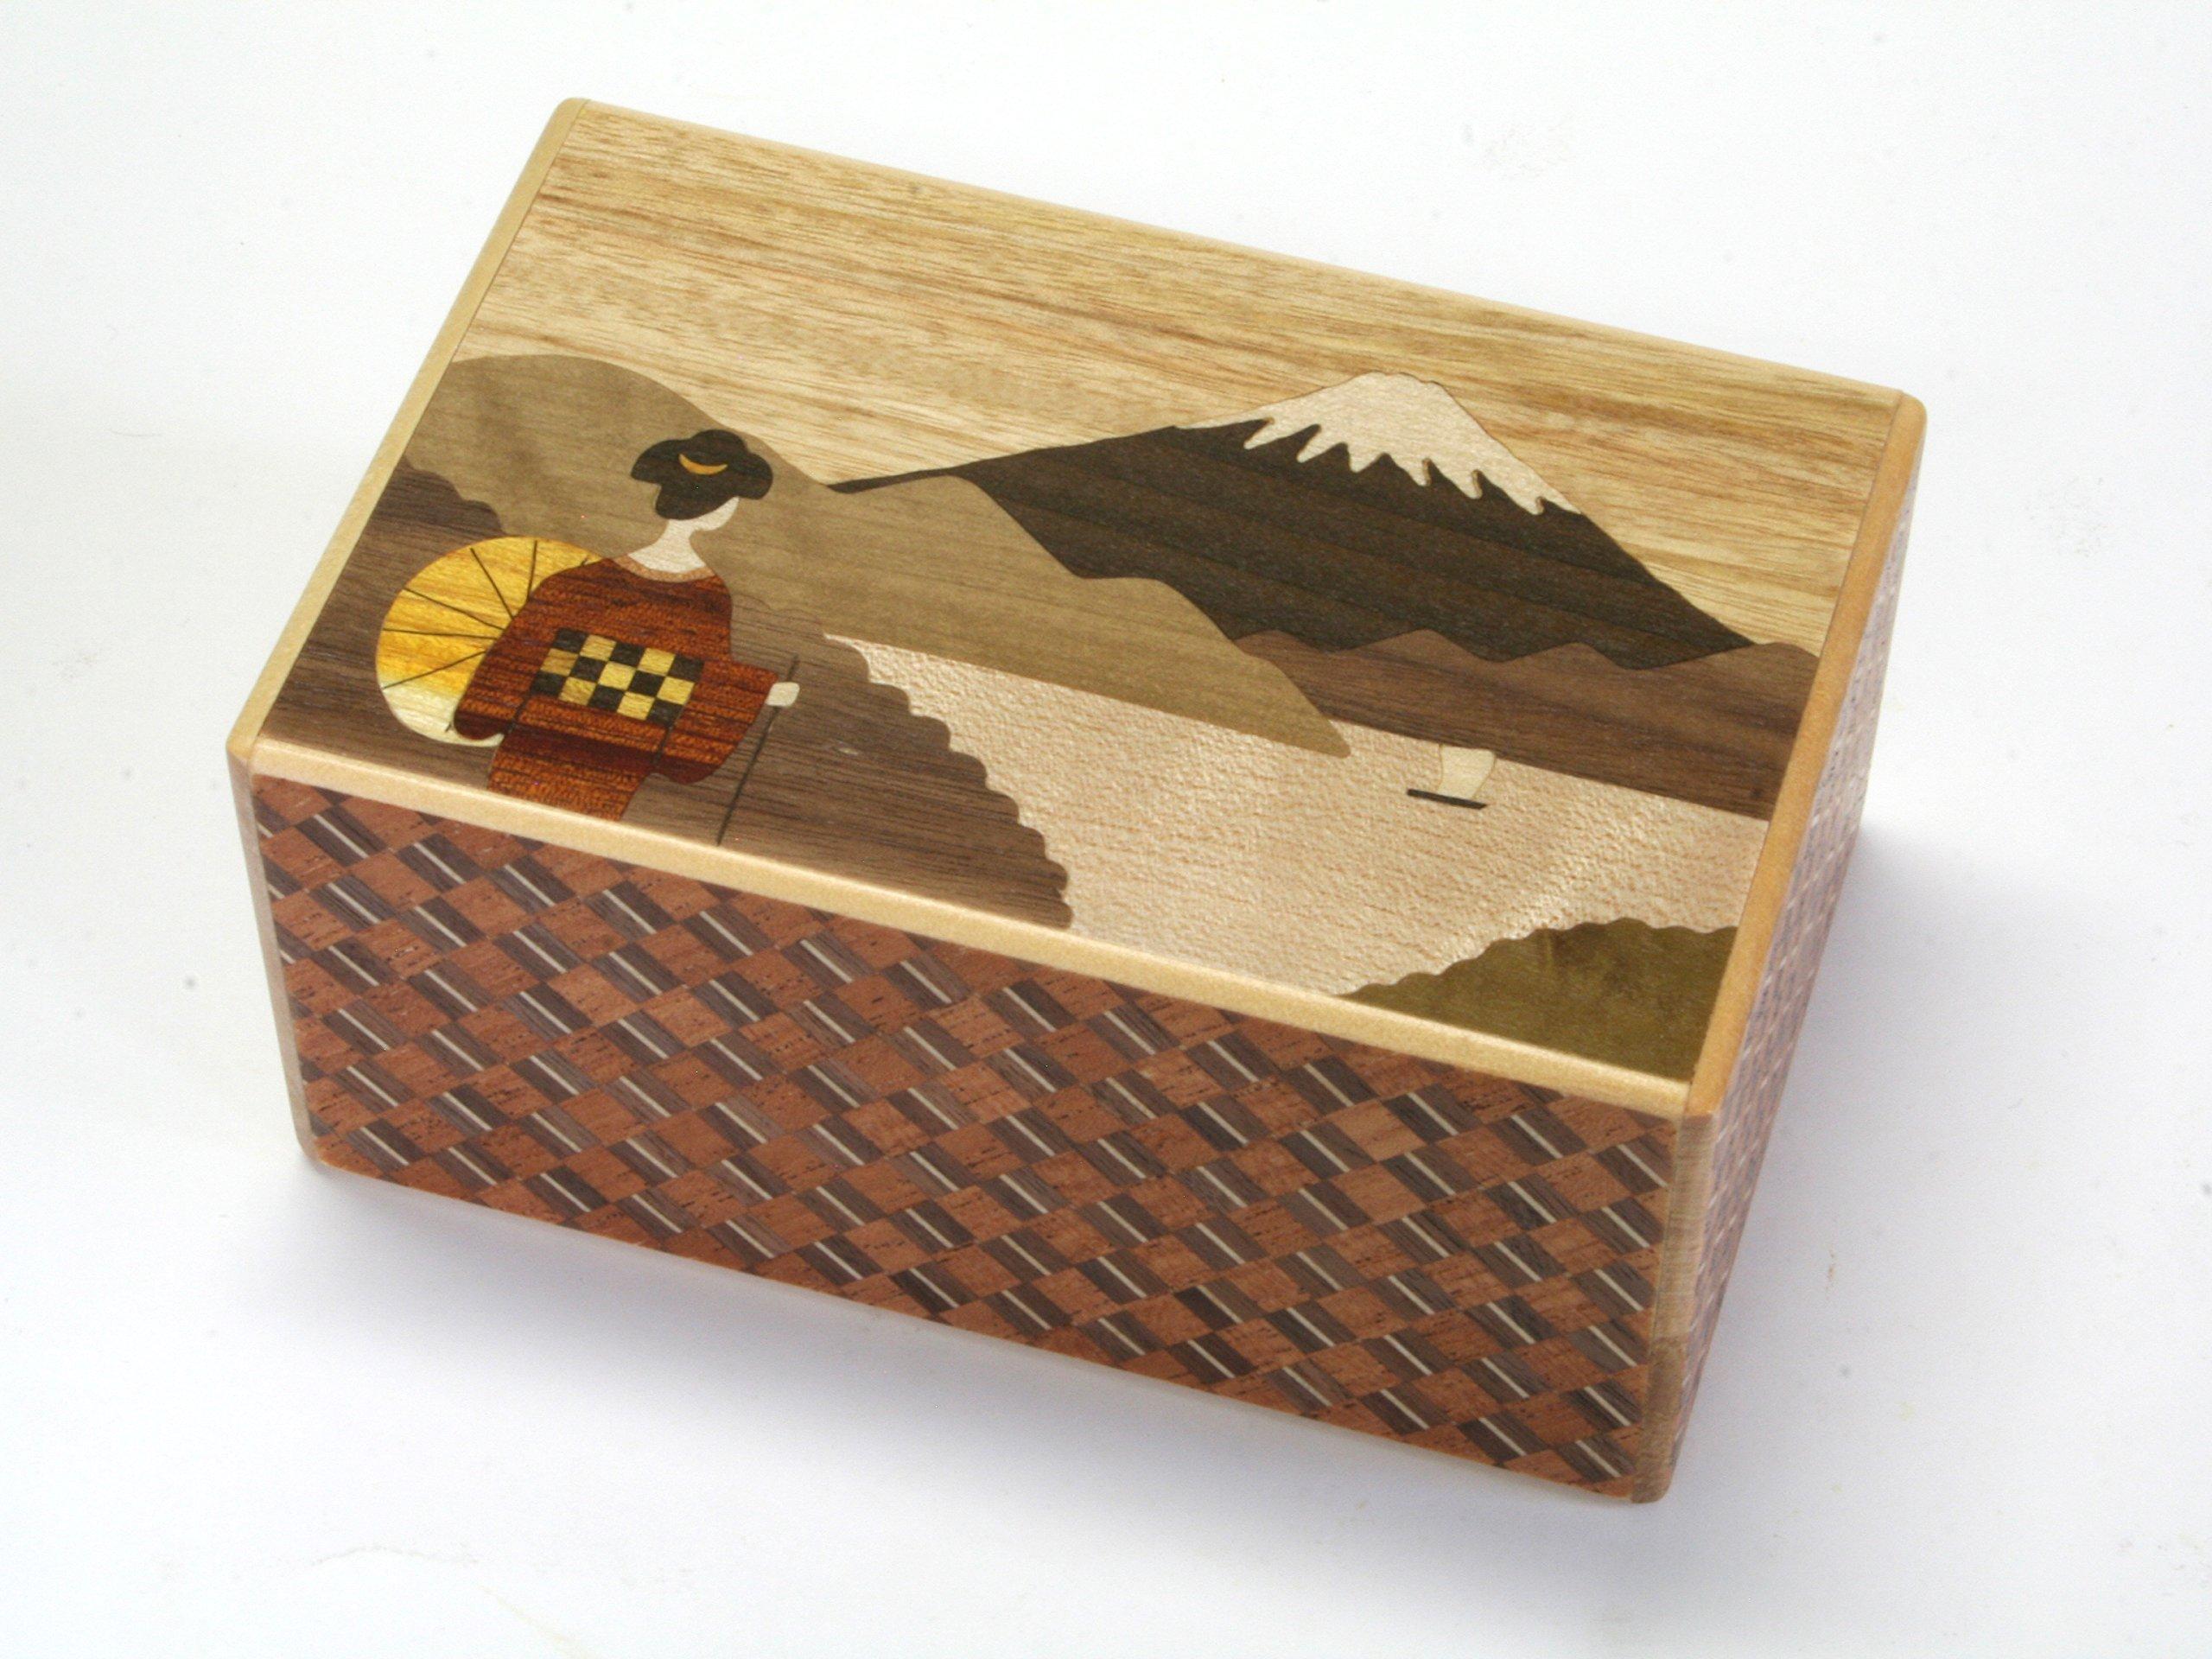 Japanese Puzzle Box 21steps Maiko by Hakone Maruyama